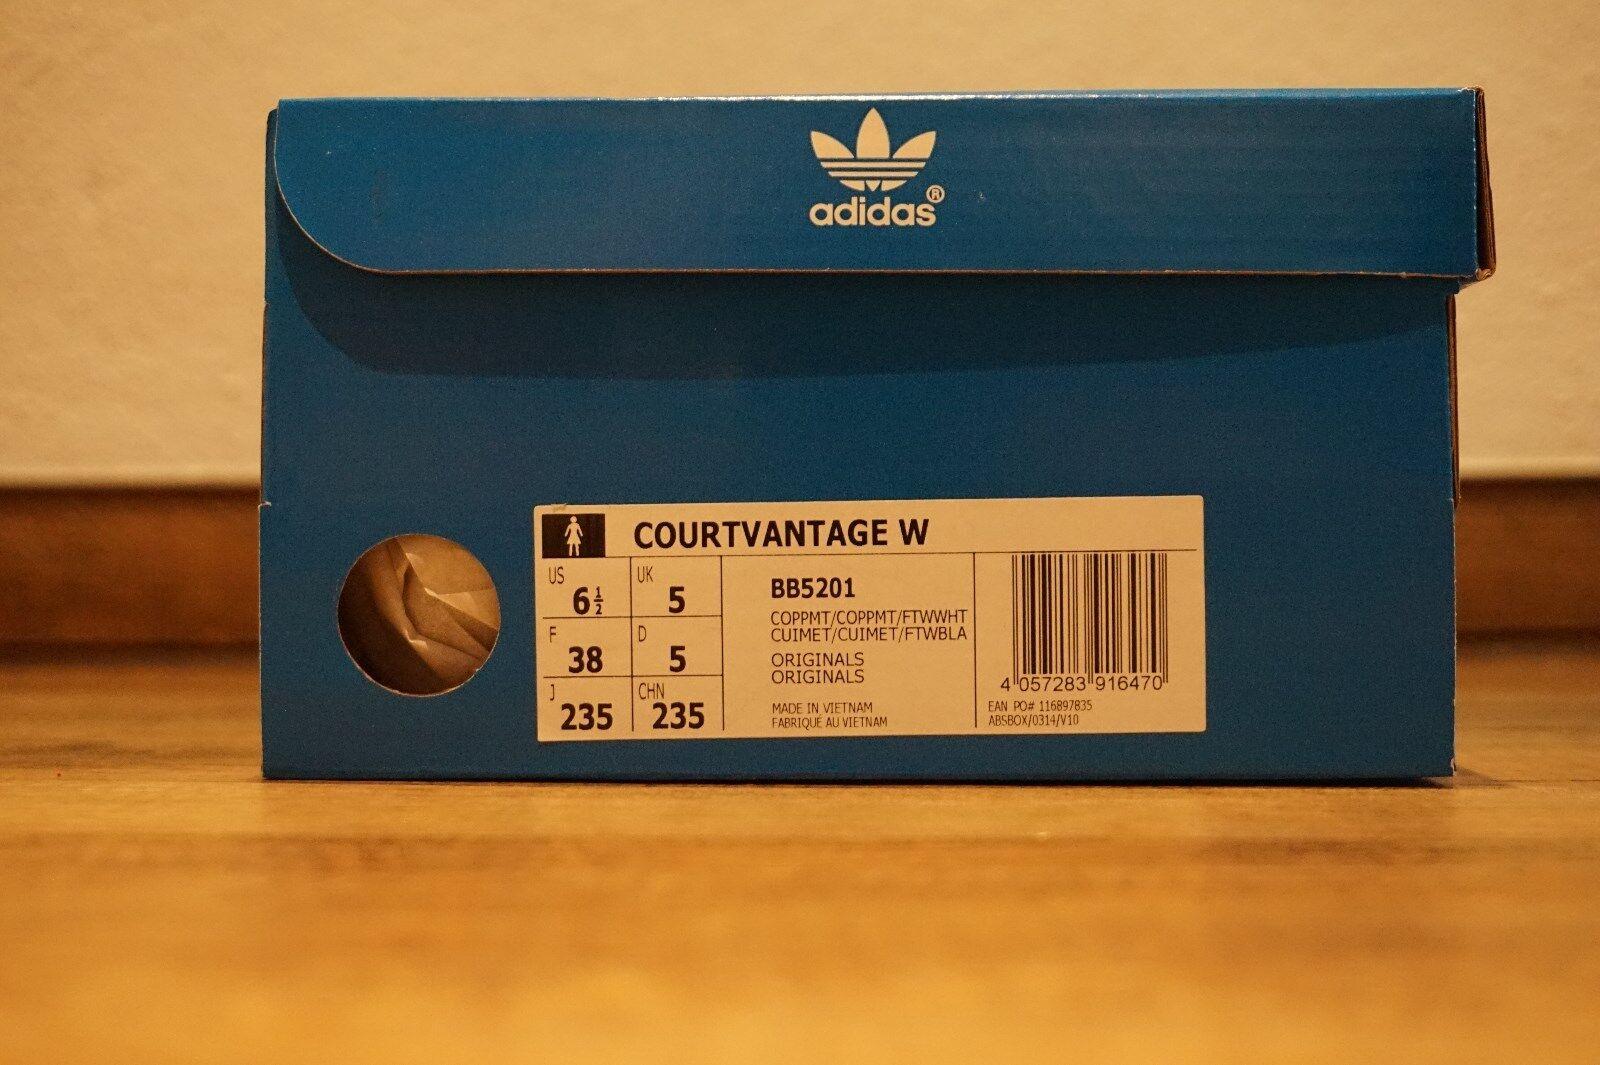 Adidas Courtvantage - EUR 38 NEU - US 6.5 - NEU 38 - NEW - DoubleBoxed f5480f